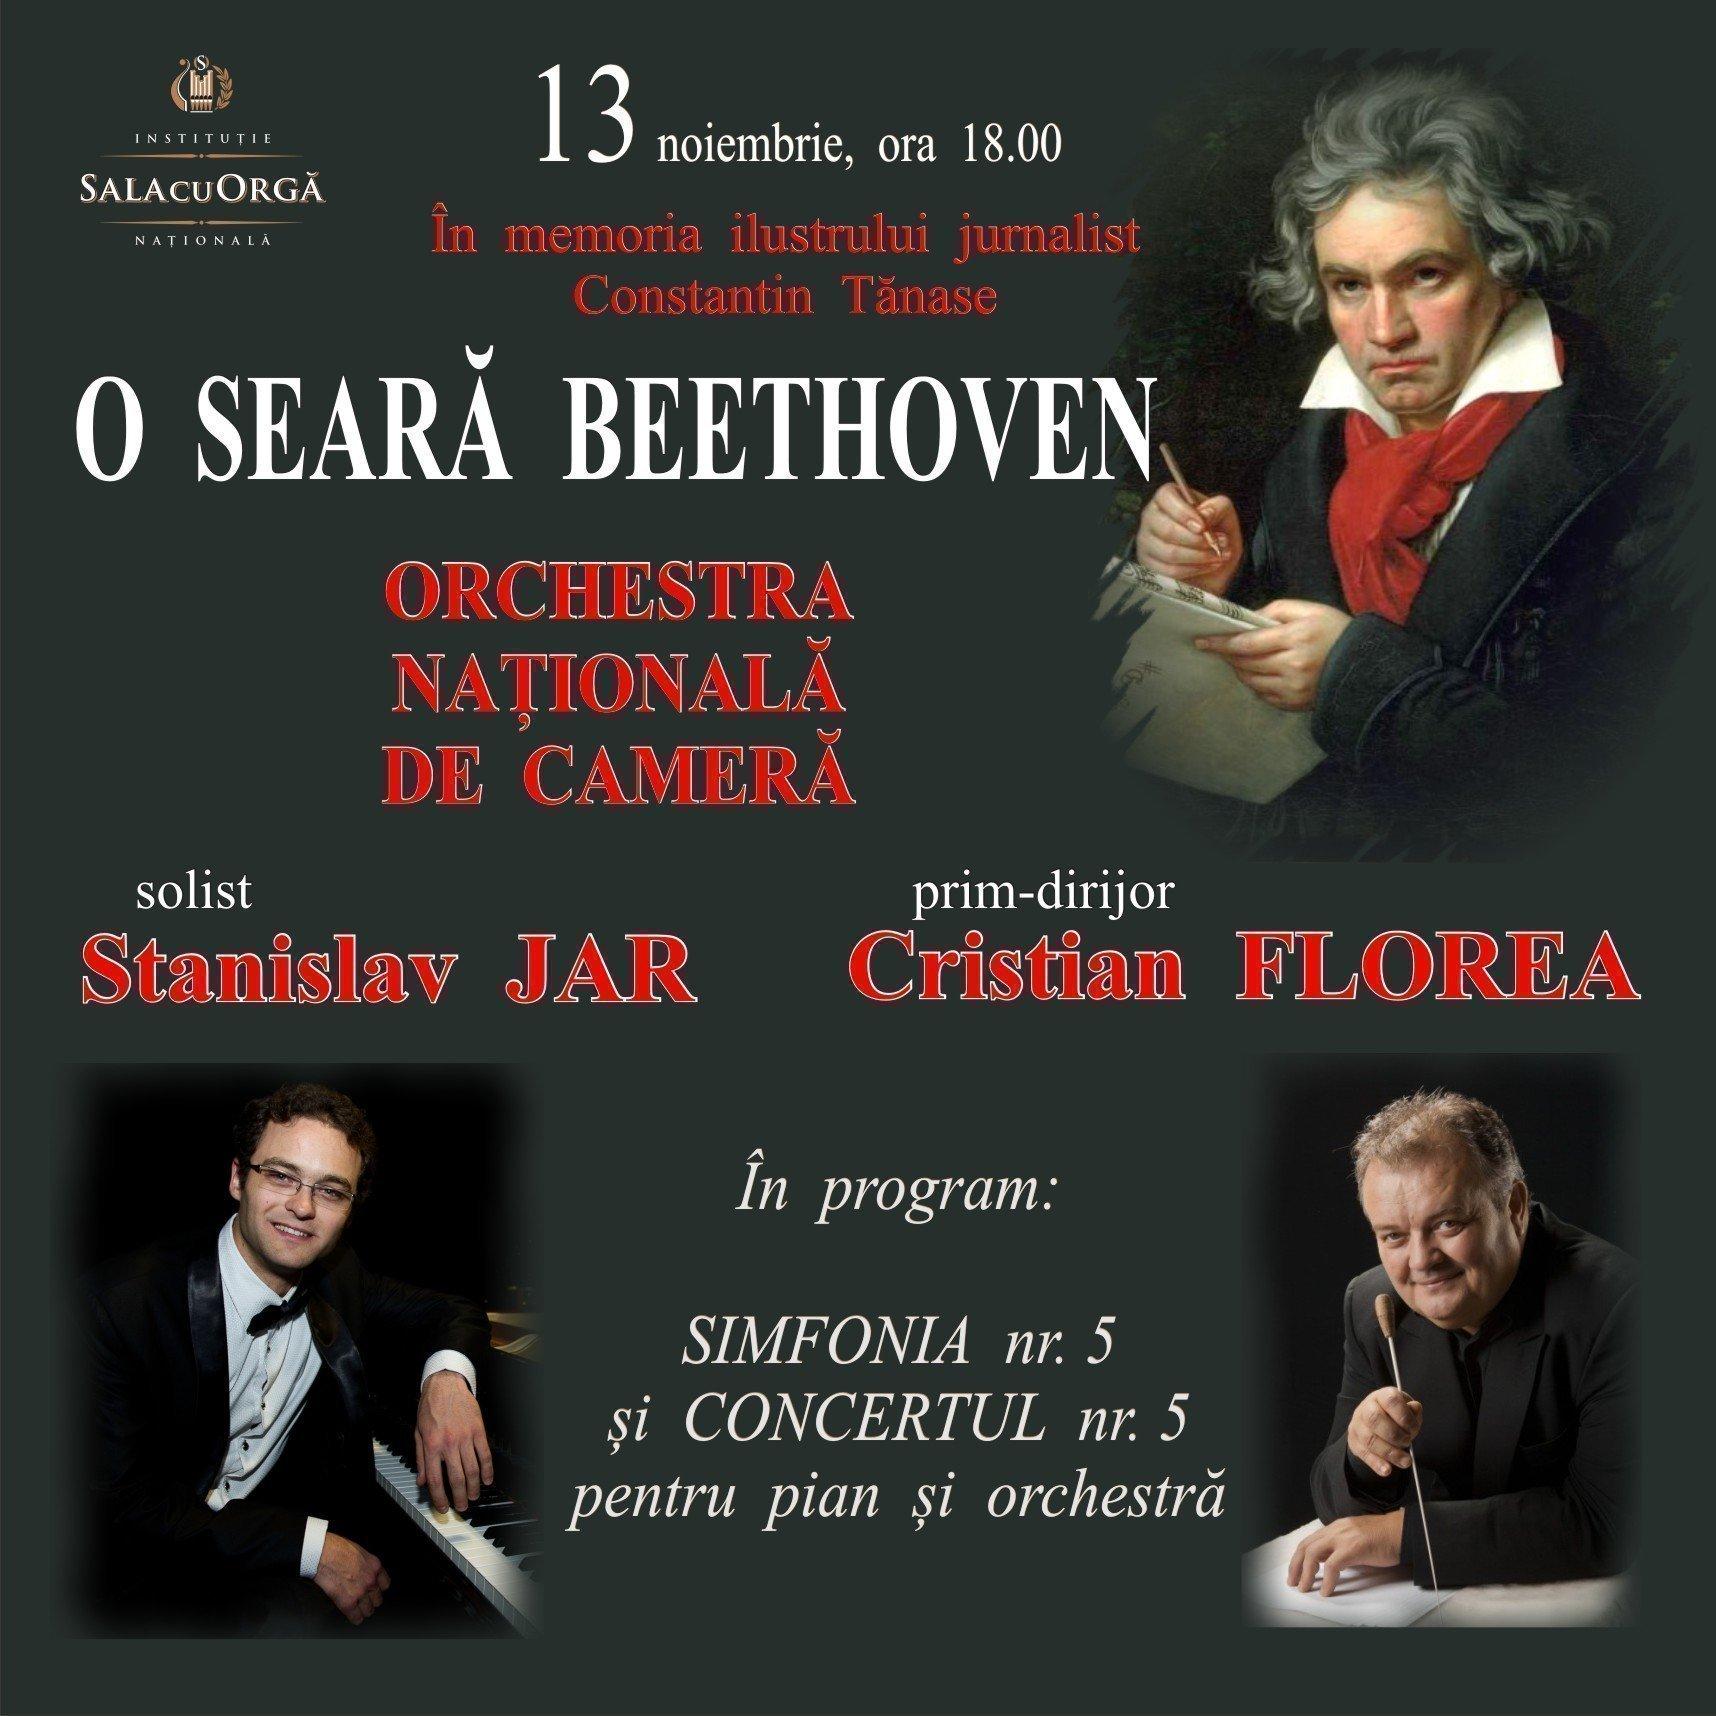 O seara Beethoven